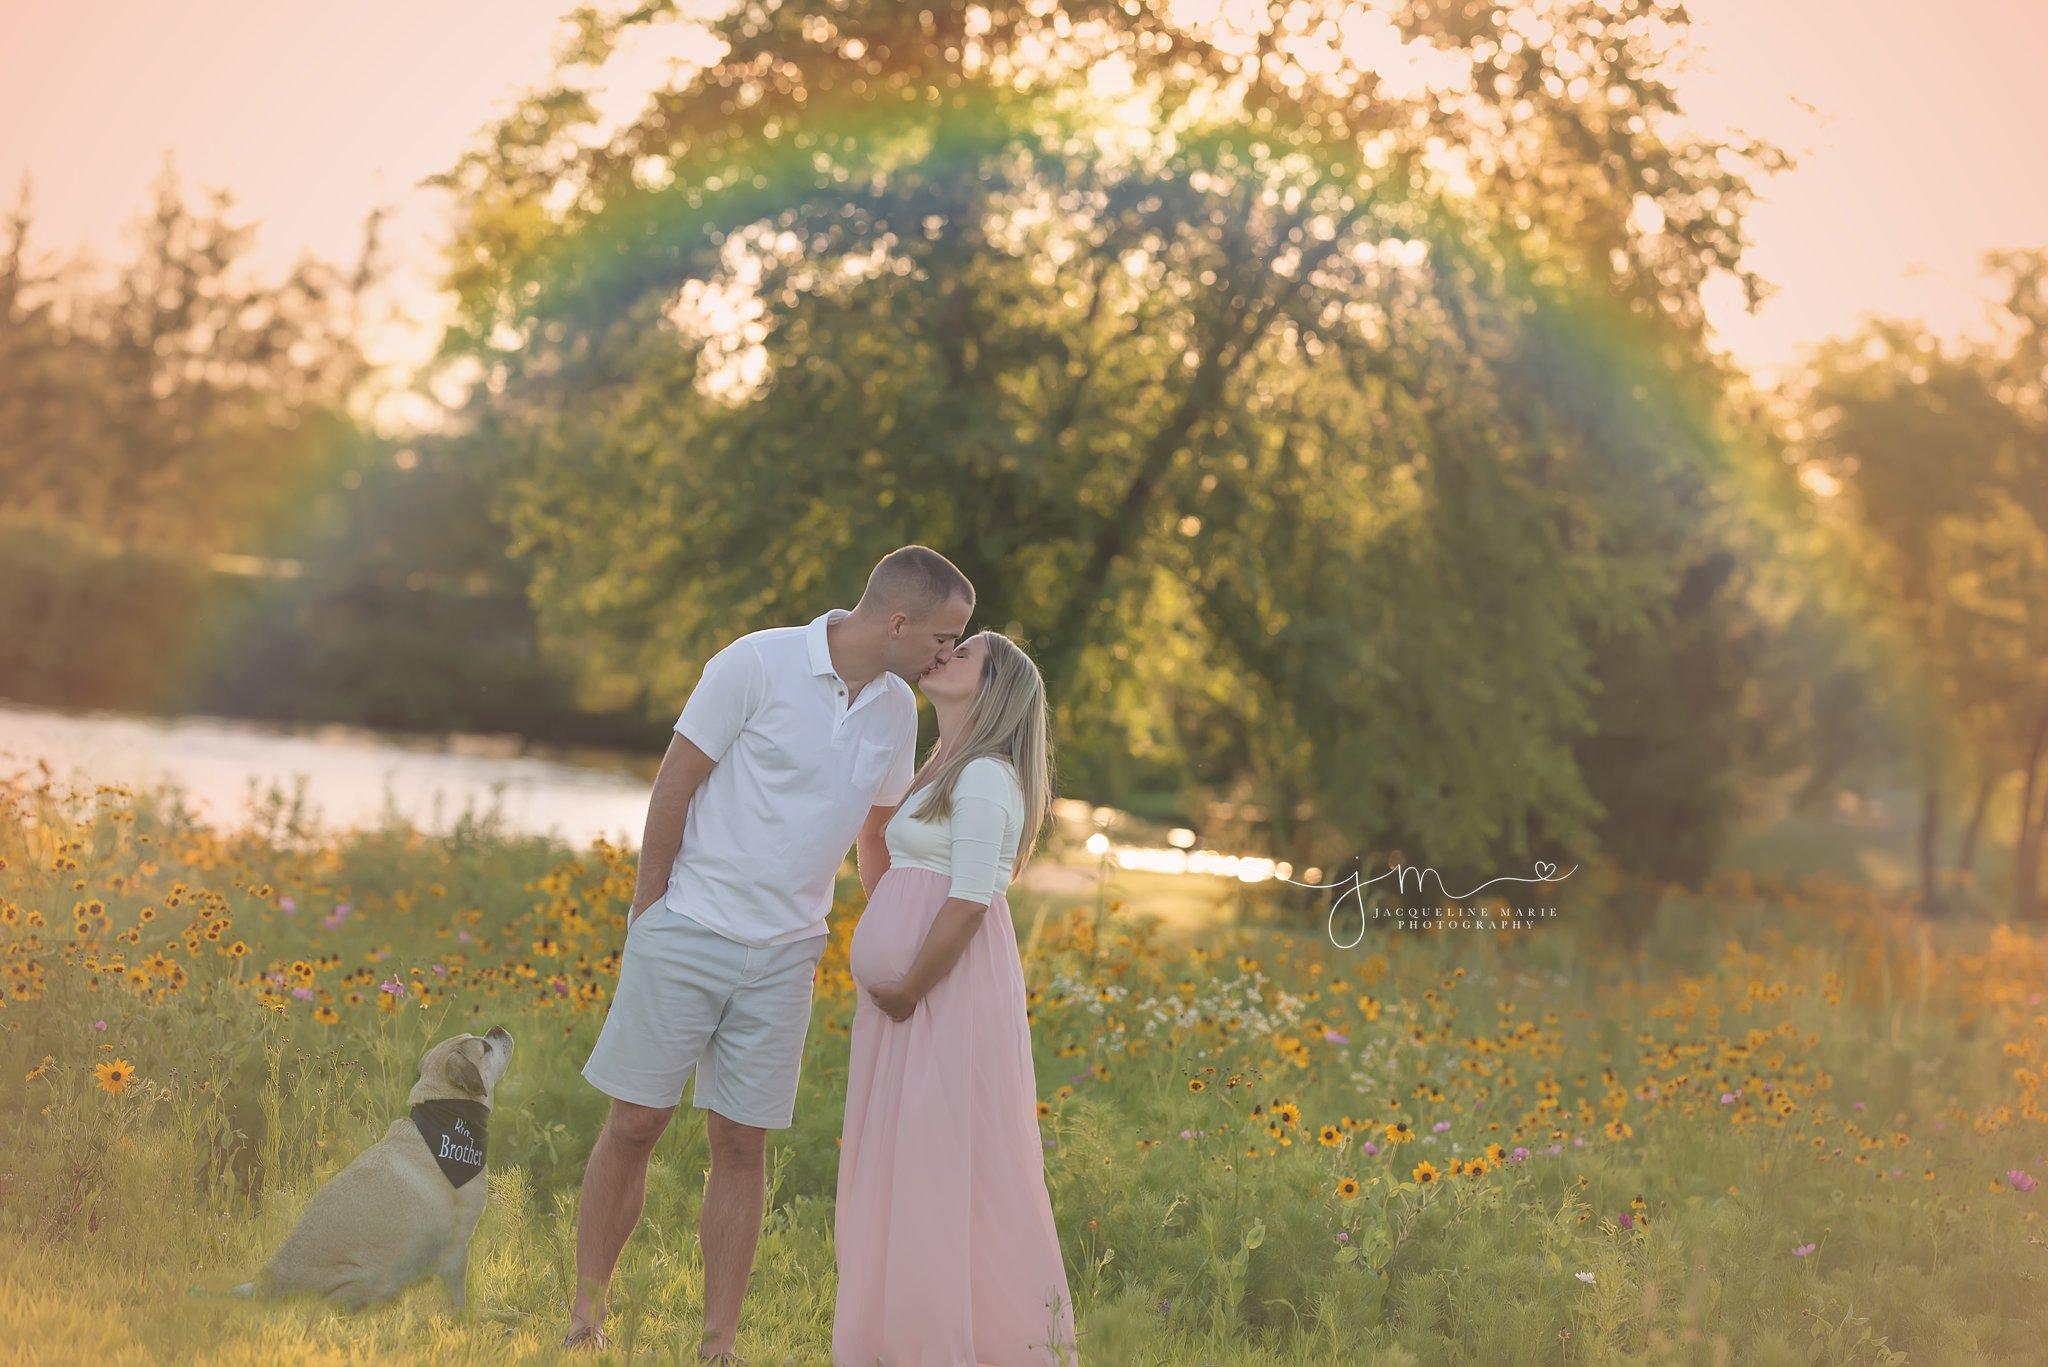 columbus ohio maternity photographer features rainbow baby image for family awaiting their rainbow baby